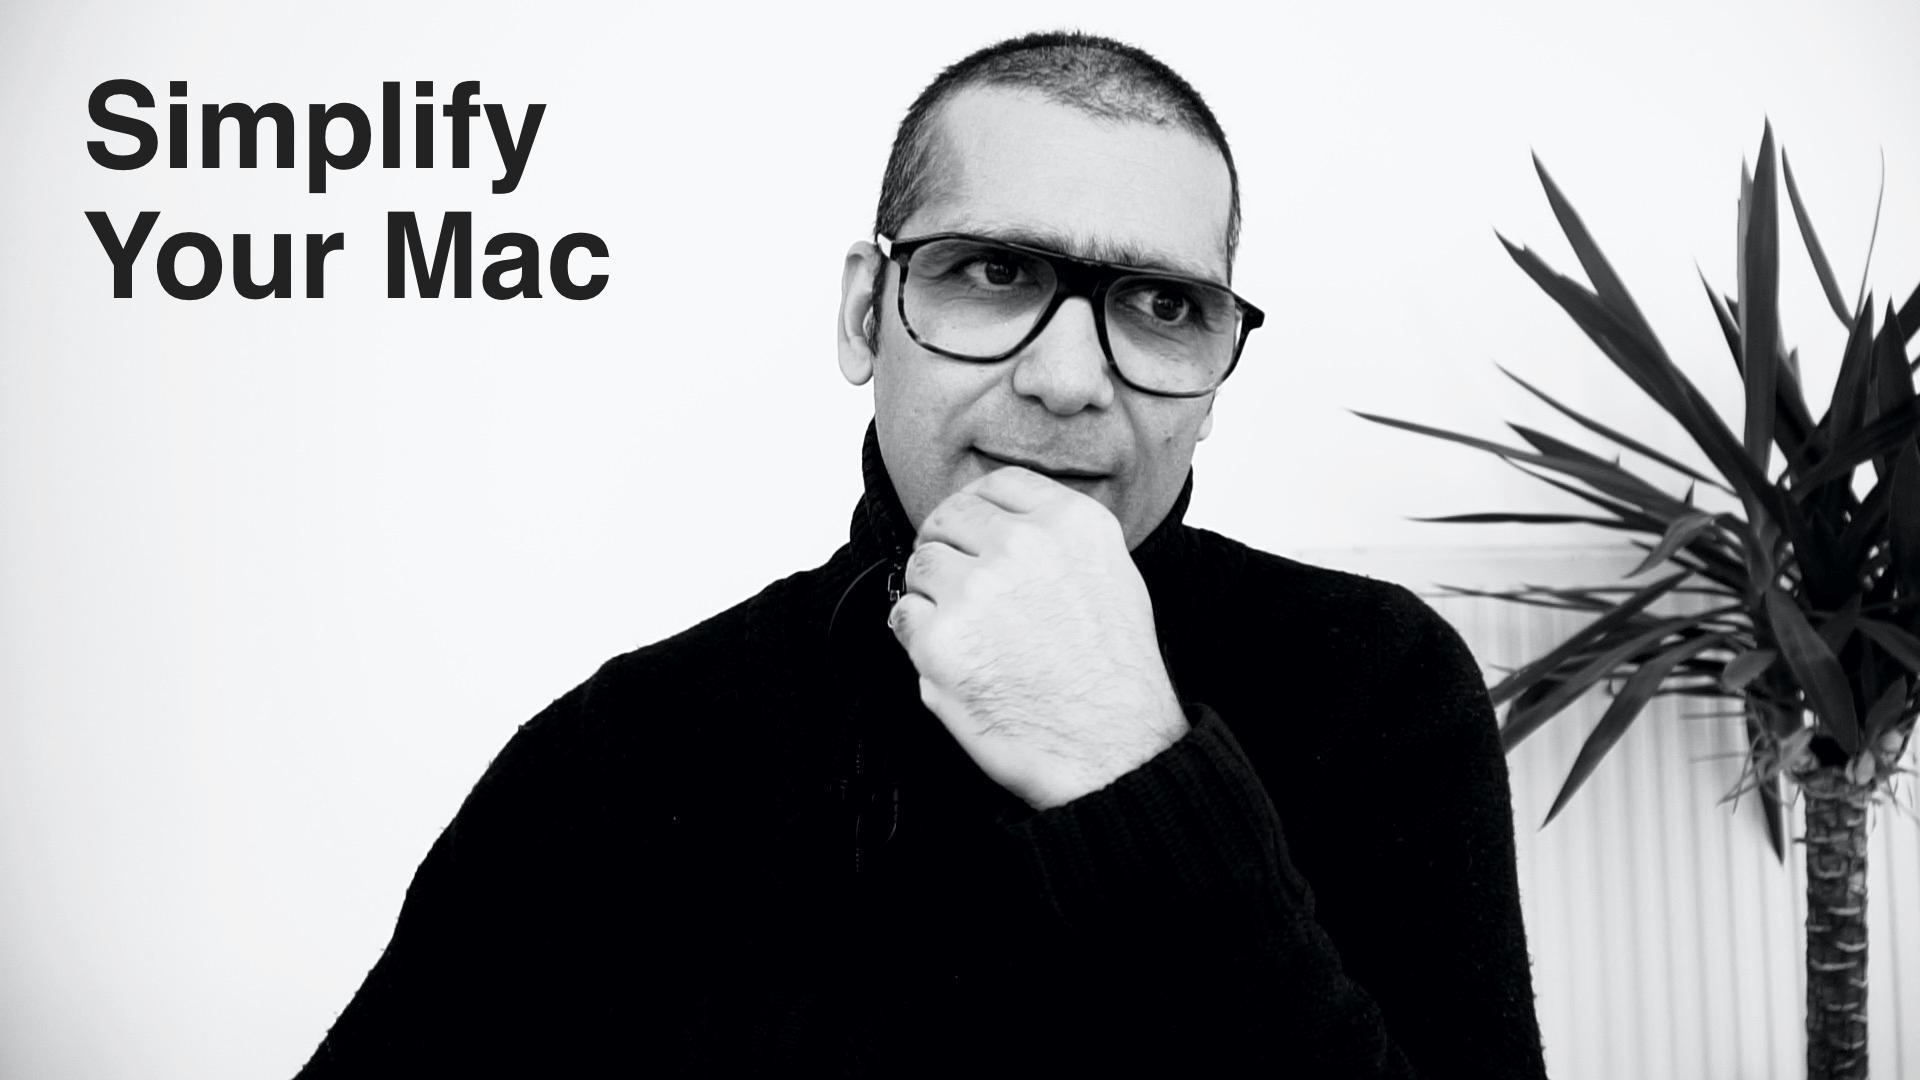 Simplify your Mac